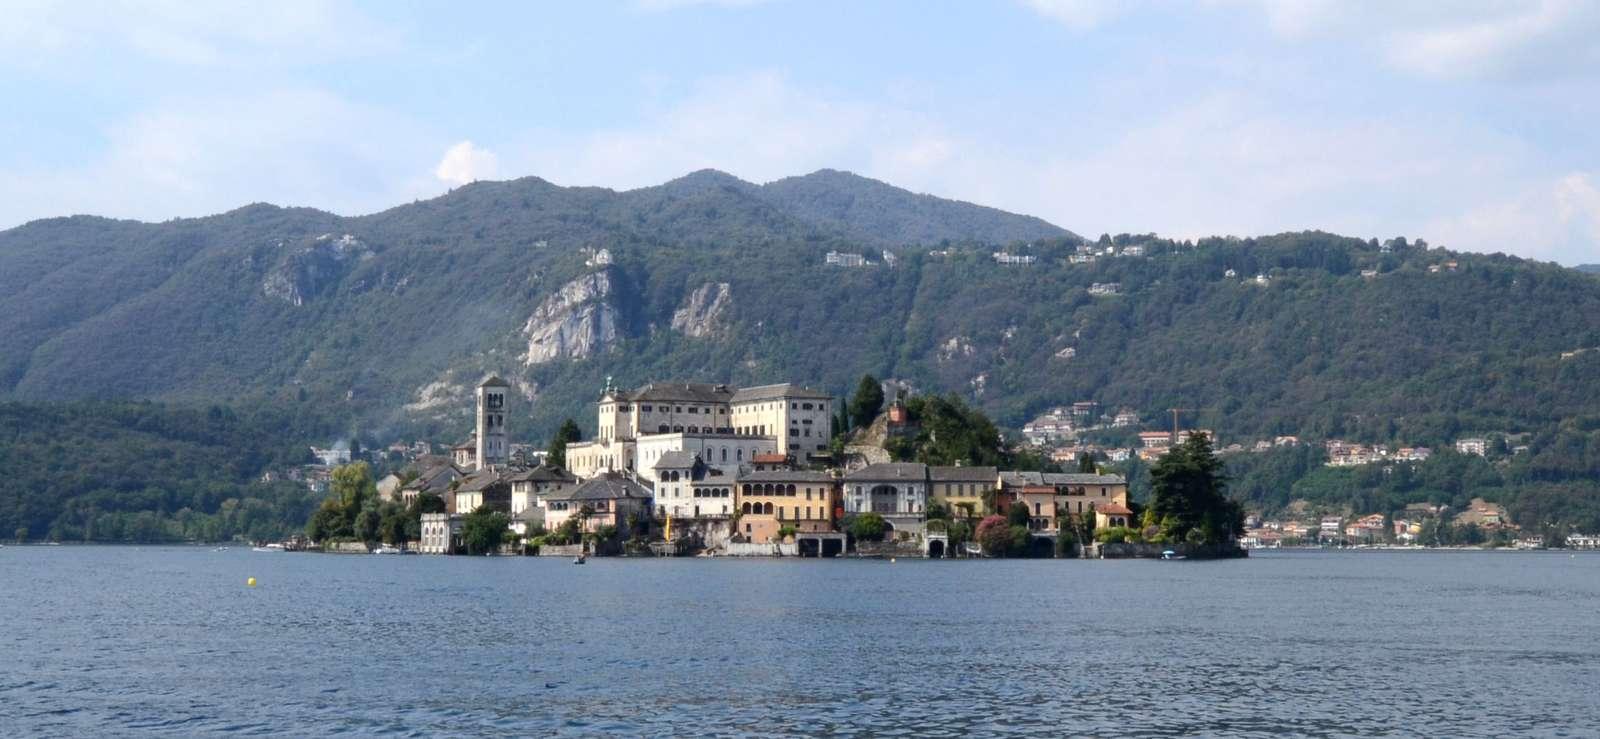 Øen Isola San Giulio set fra byen Orta San Giulio